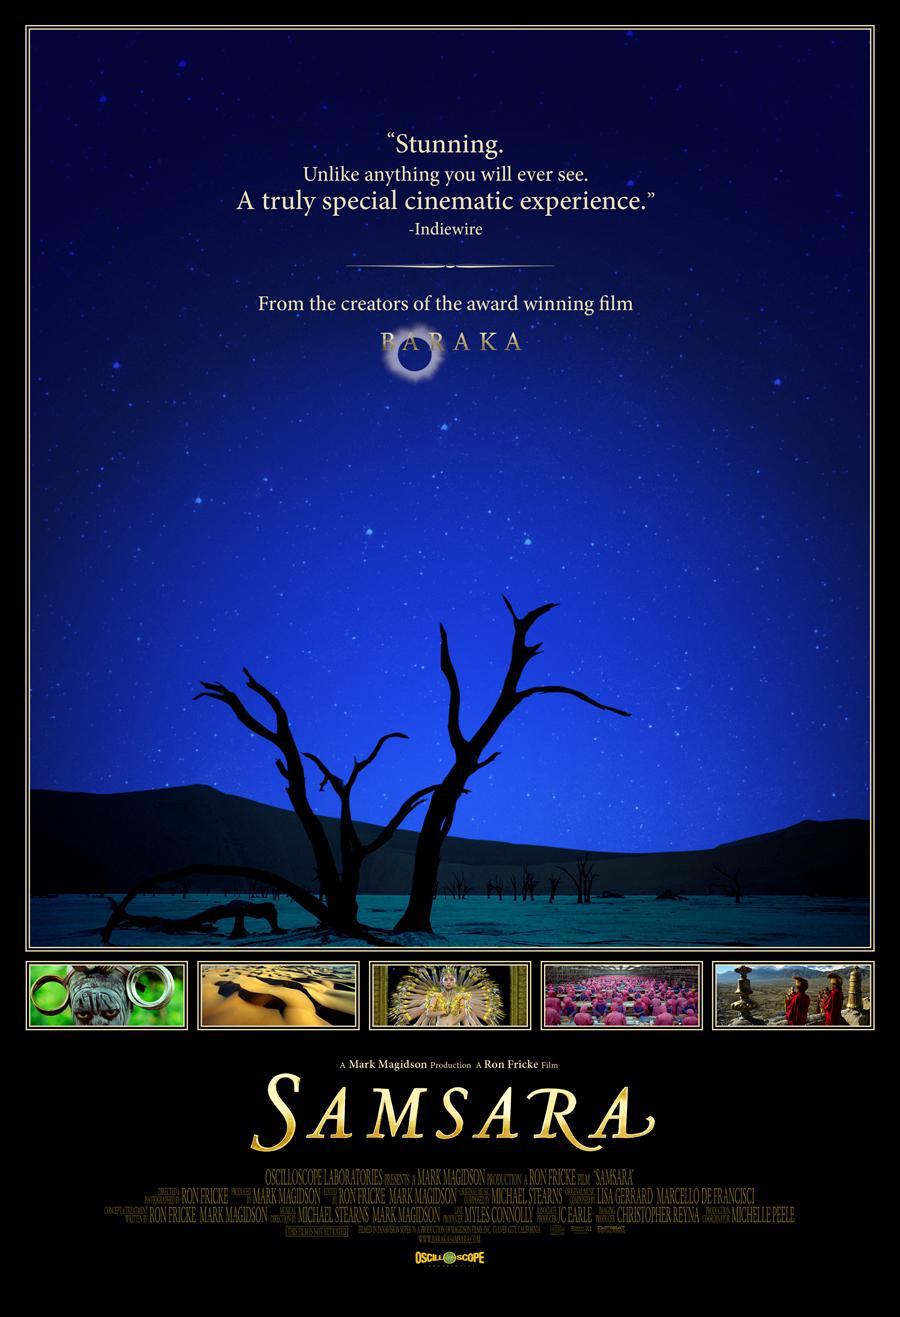 http://3.bp.blogspot.com/-_vnLfhR5KUg/UBZr3rXLoKI/AAAAAAAACRs/ZjEO32AG7hA/s1600/samsara_poster_large.jpg